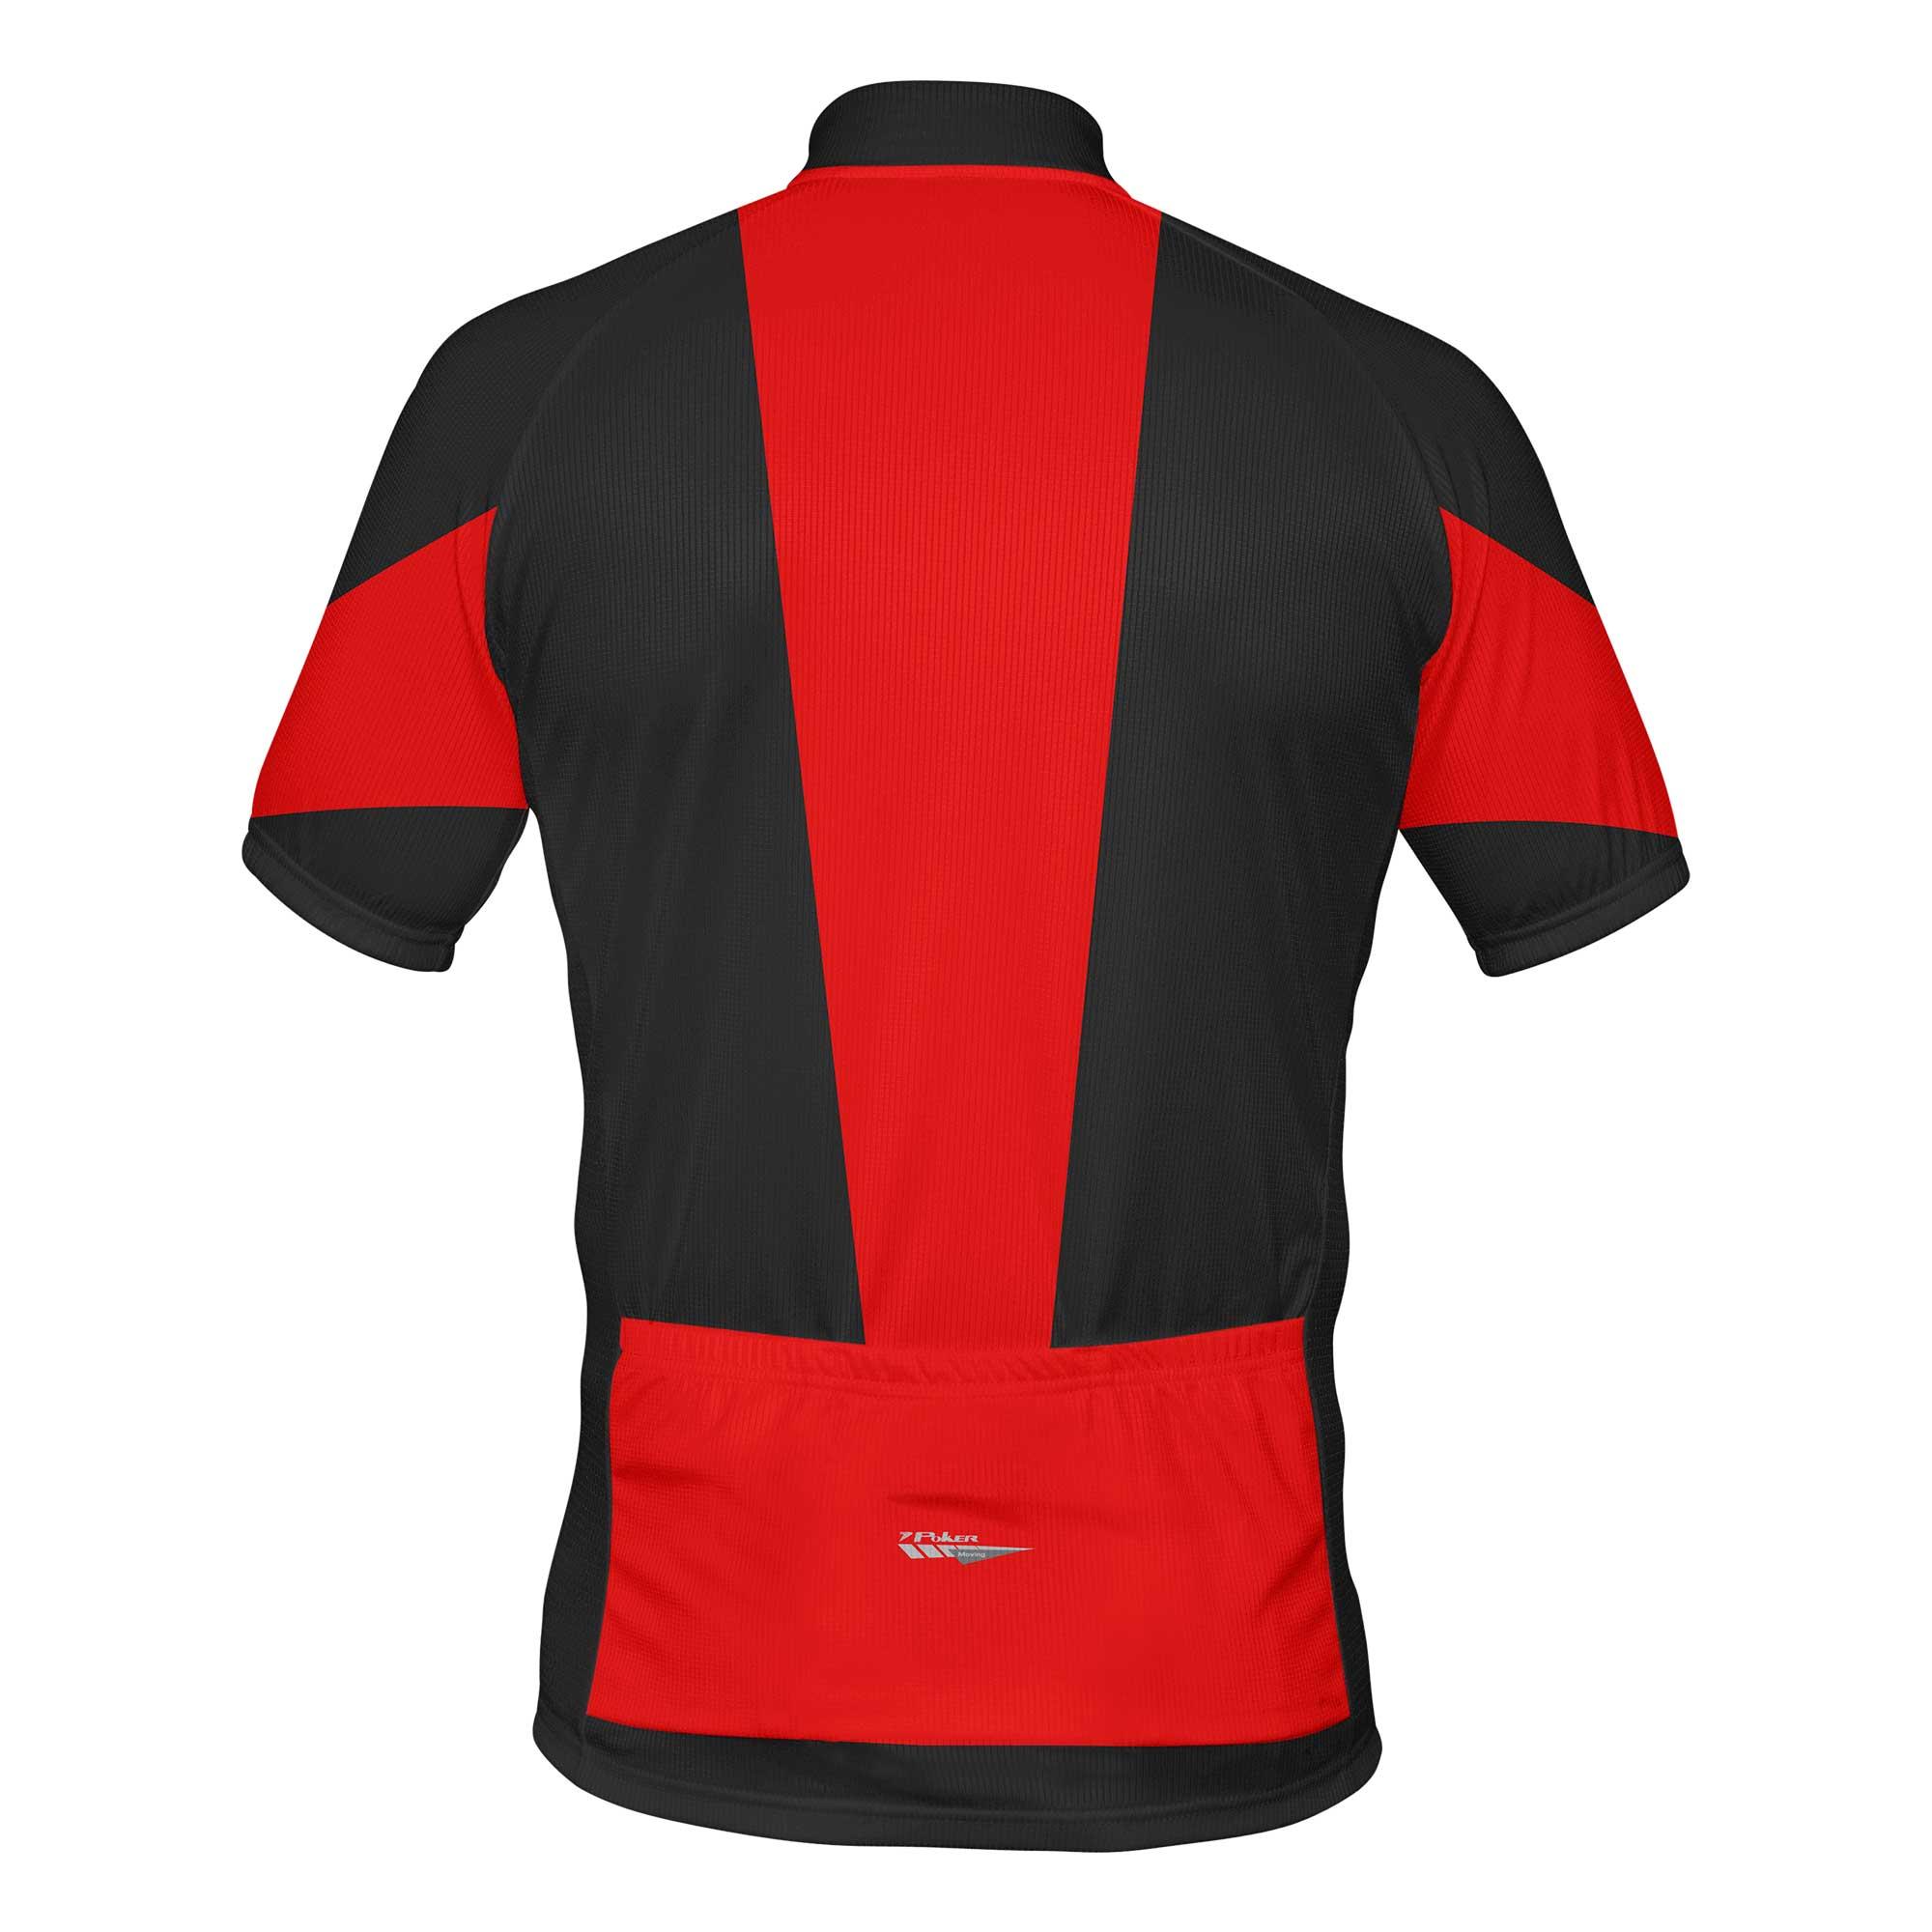 Camisa Ciclista c/ Zíper Total Rush Preto/Branco/Vermelha - Poker